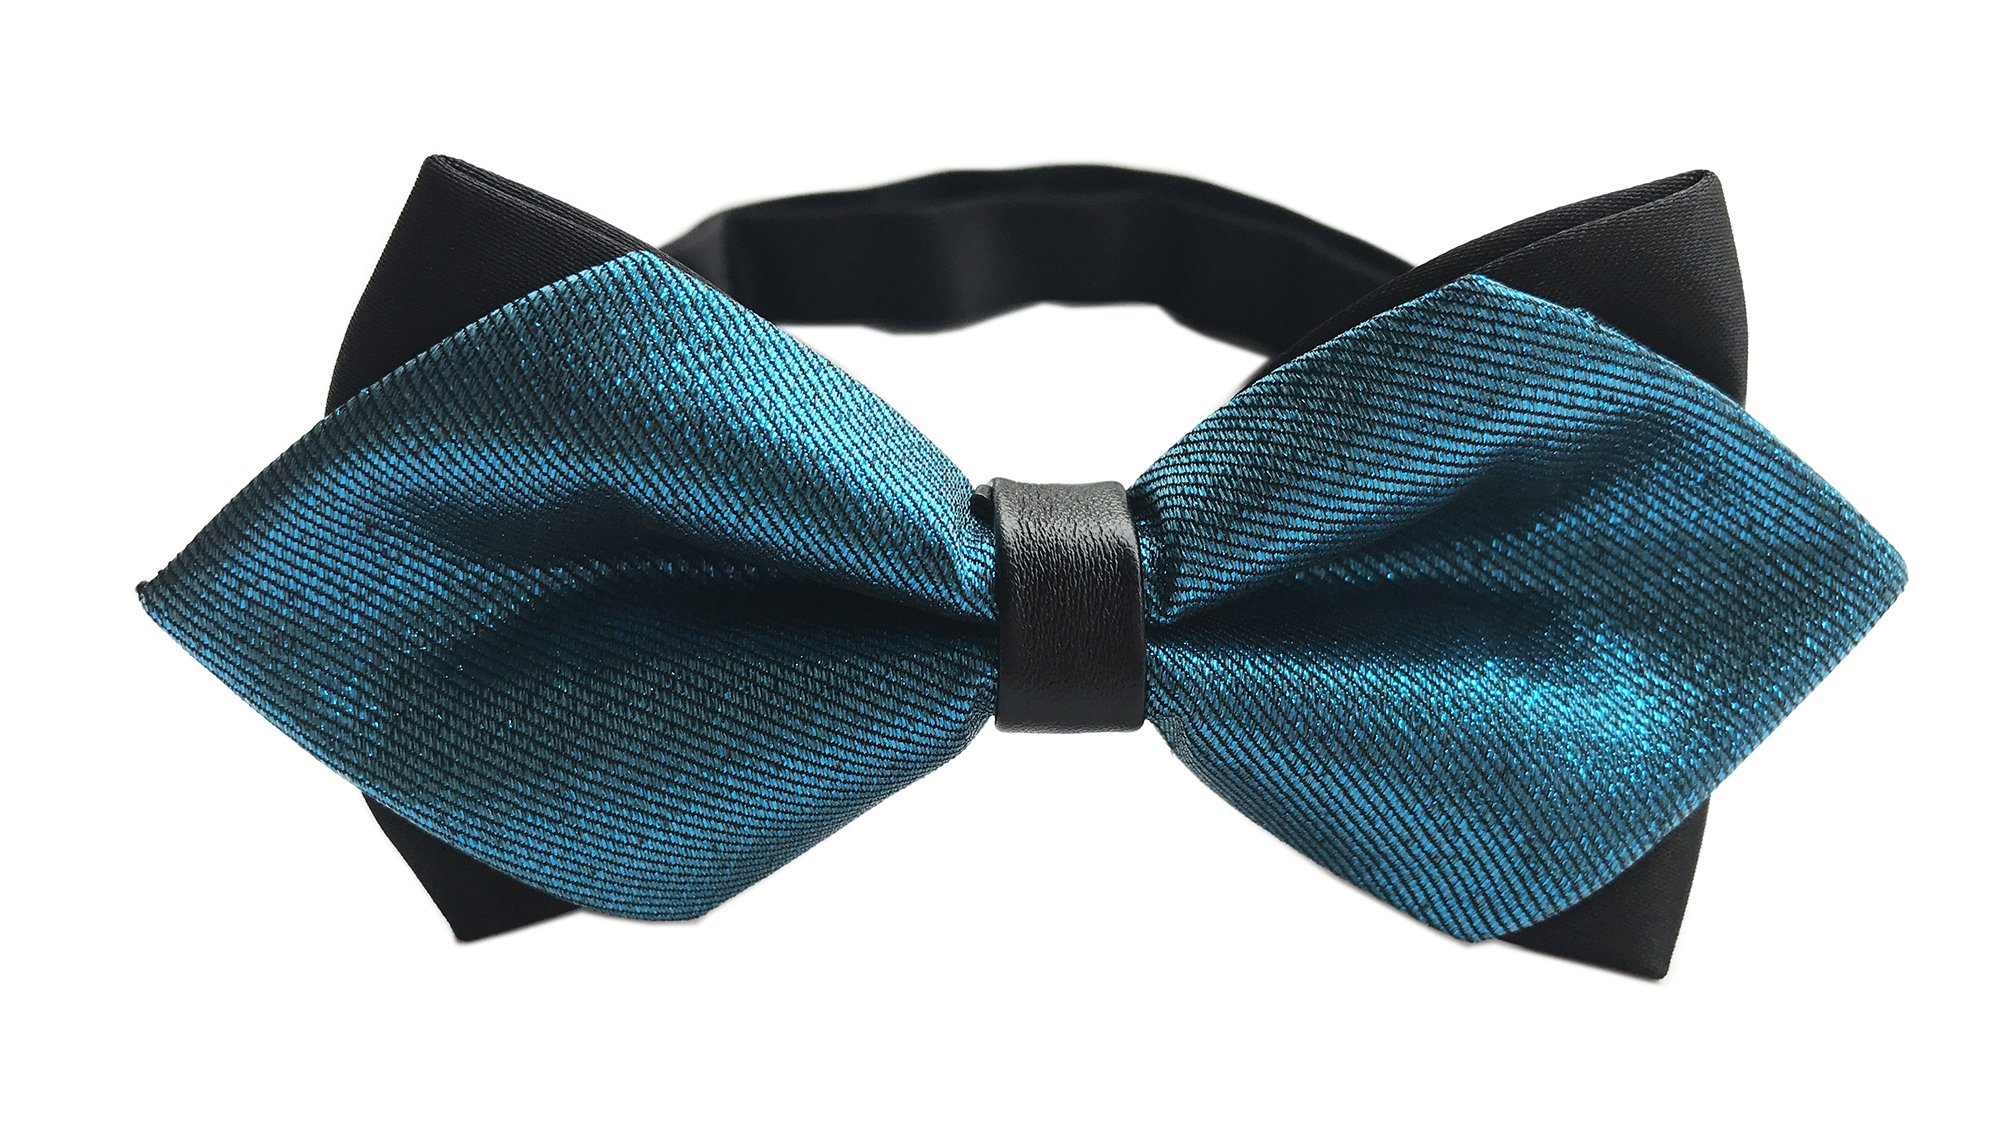 Boys Mens Modern Tuxedo Turquoise Bow Ties With Skinny fine Stirpe Shiny Bowties